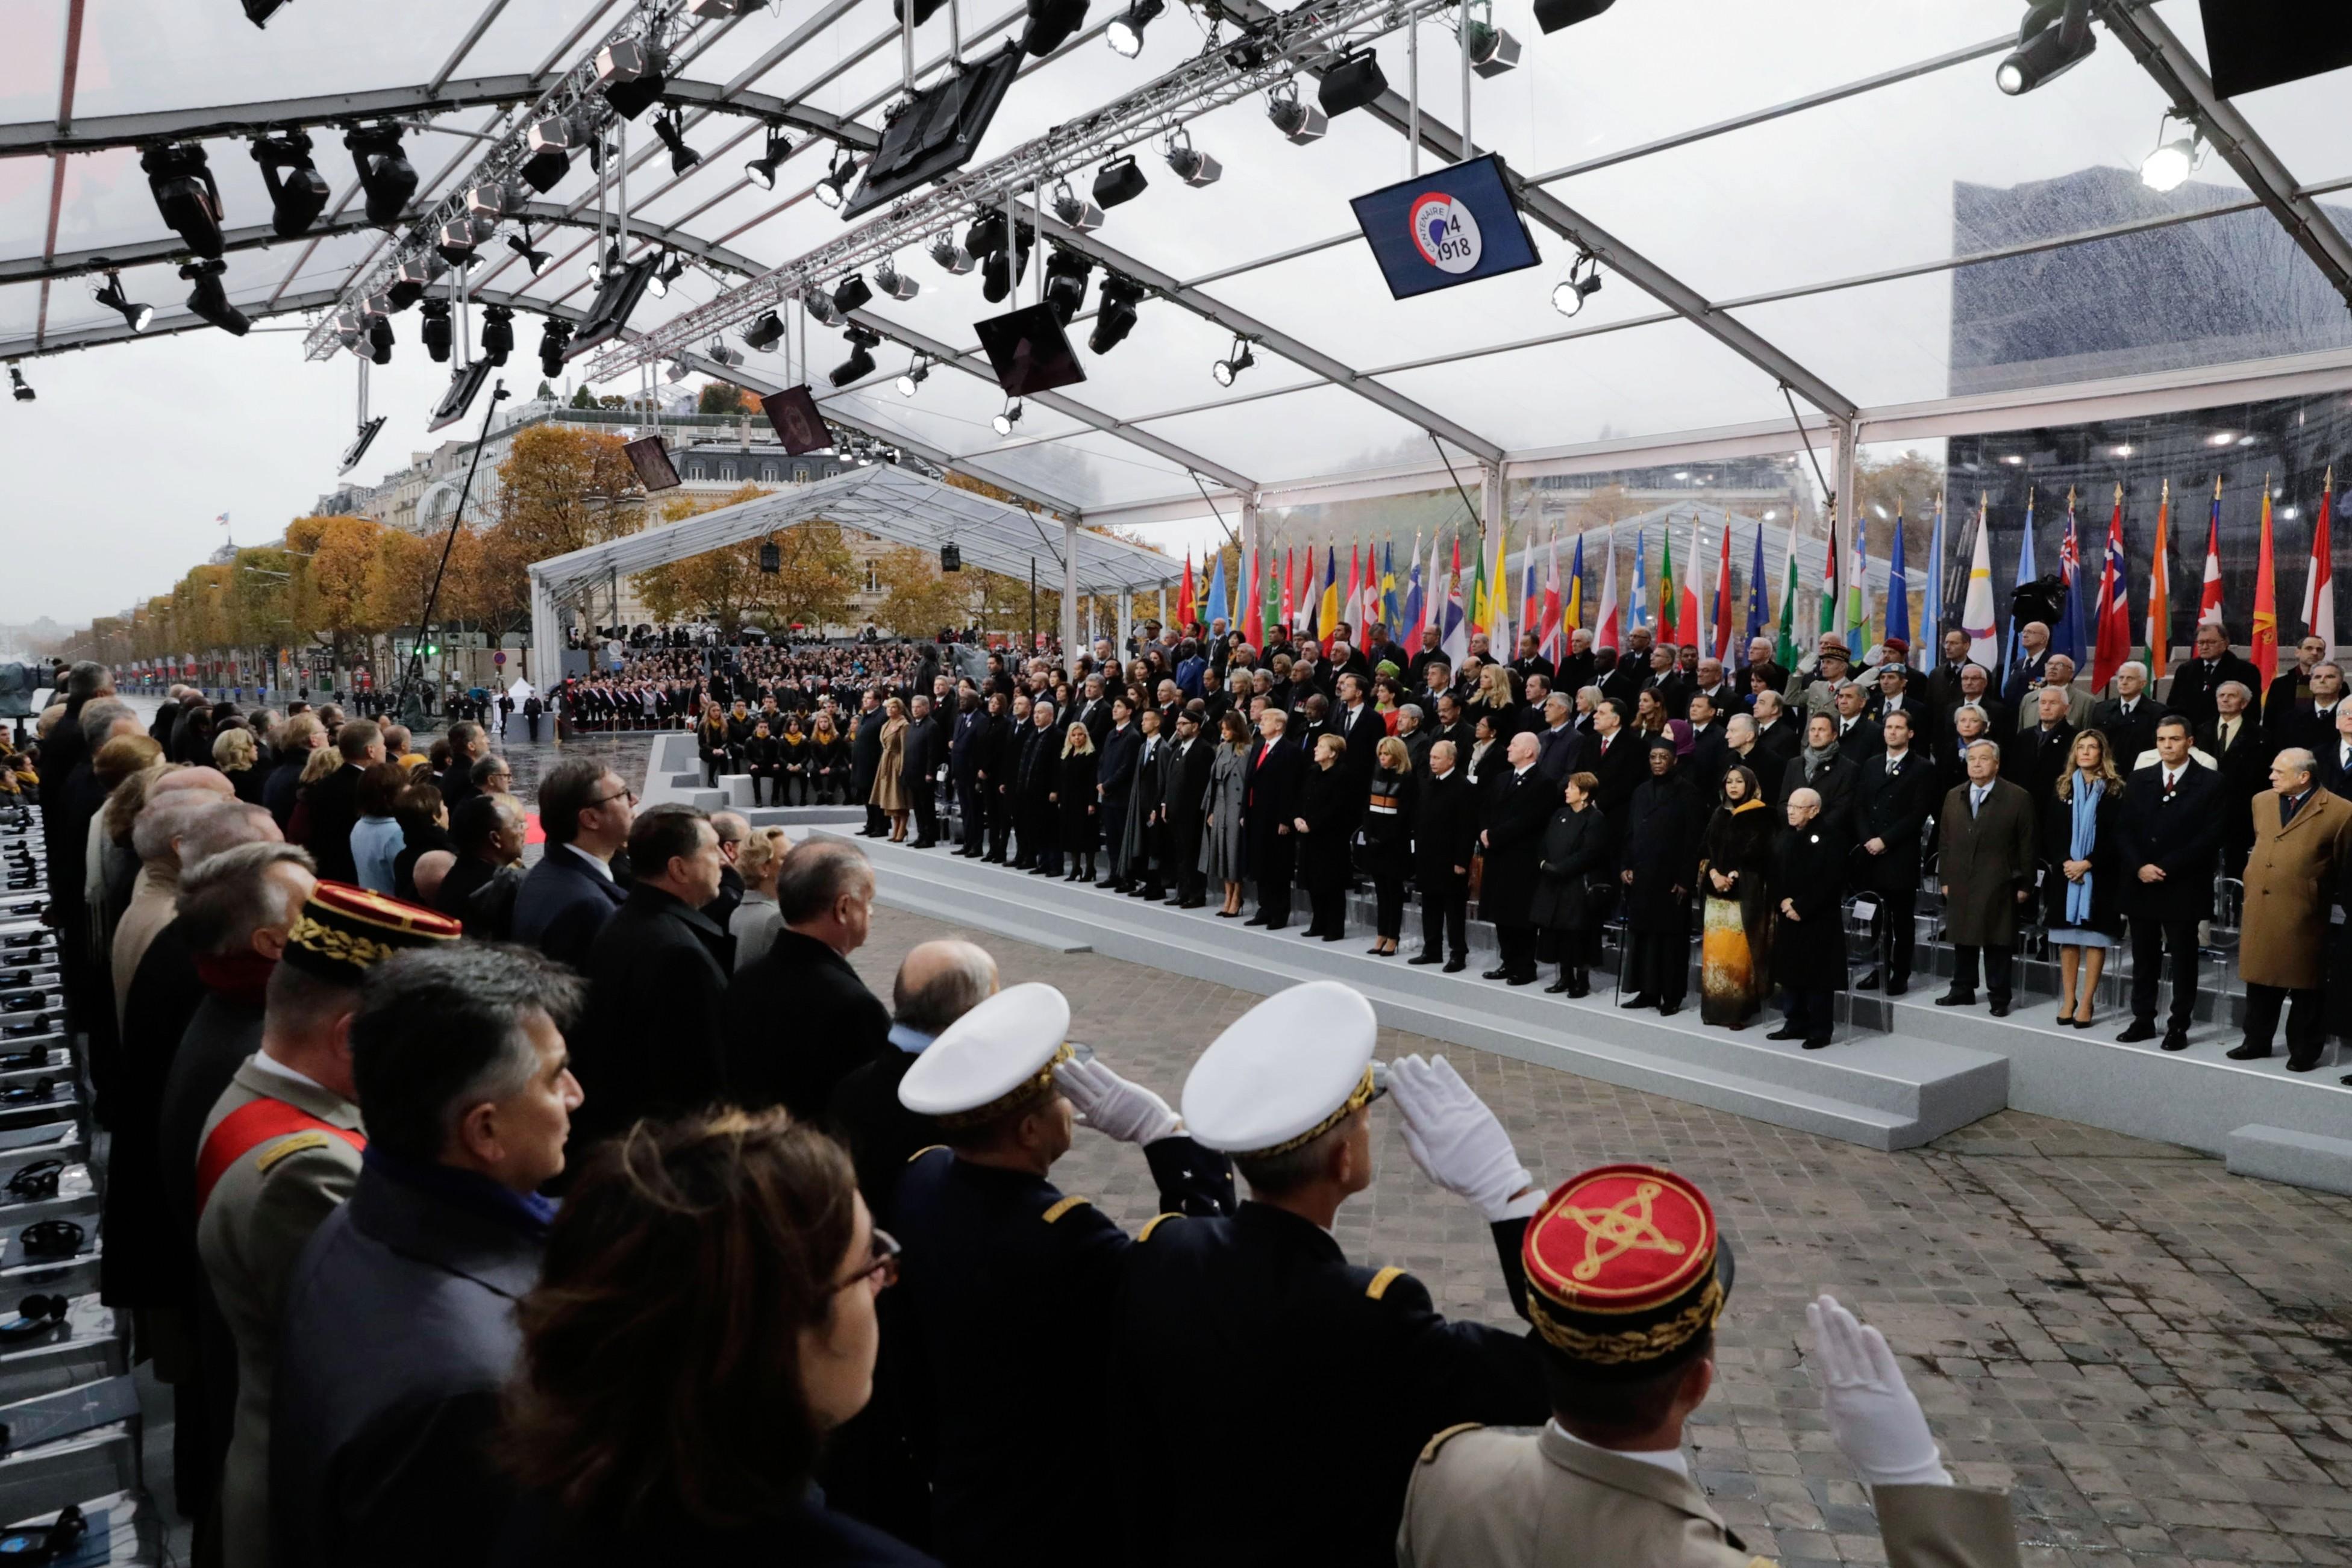 <p>Фото: &copy; РИА Новости / Михаил Мецтель/ТАСС/POOL</p>